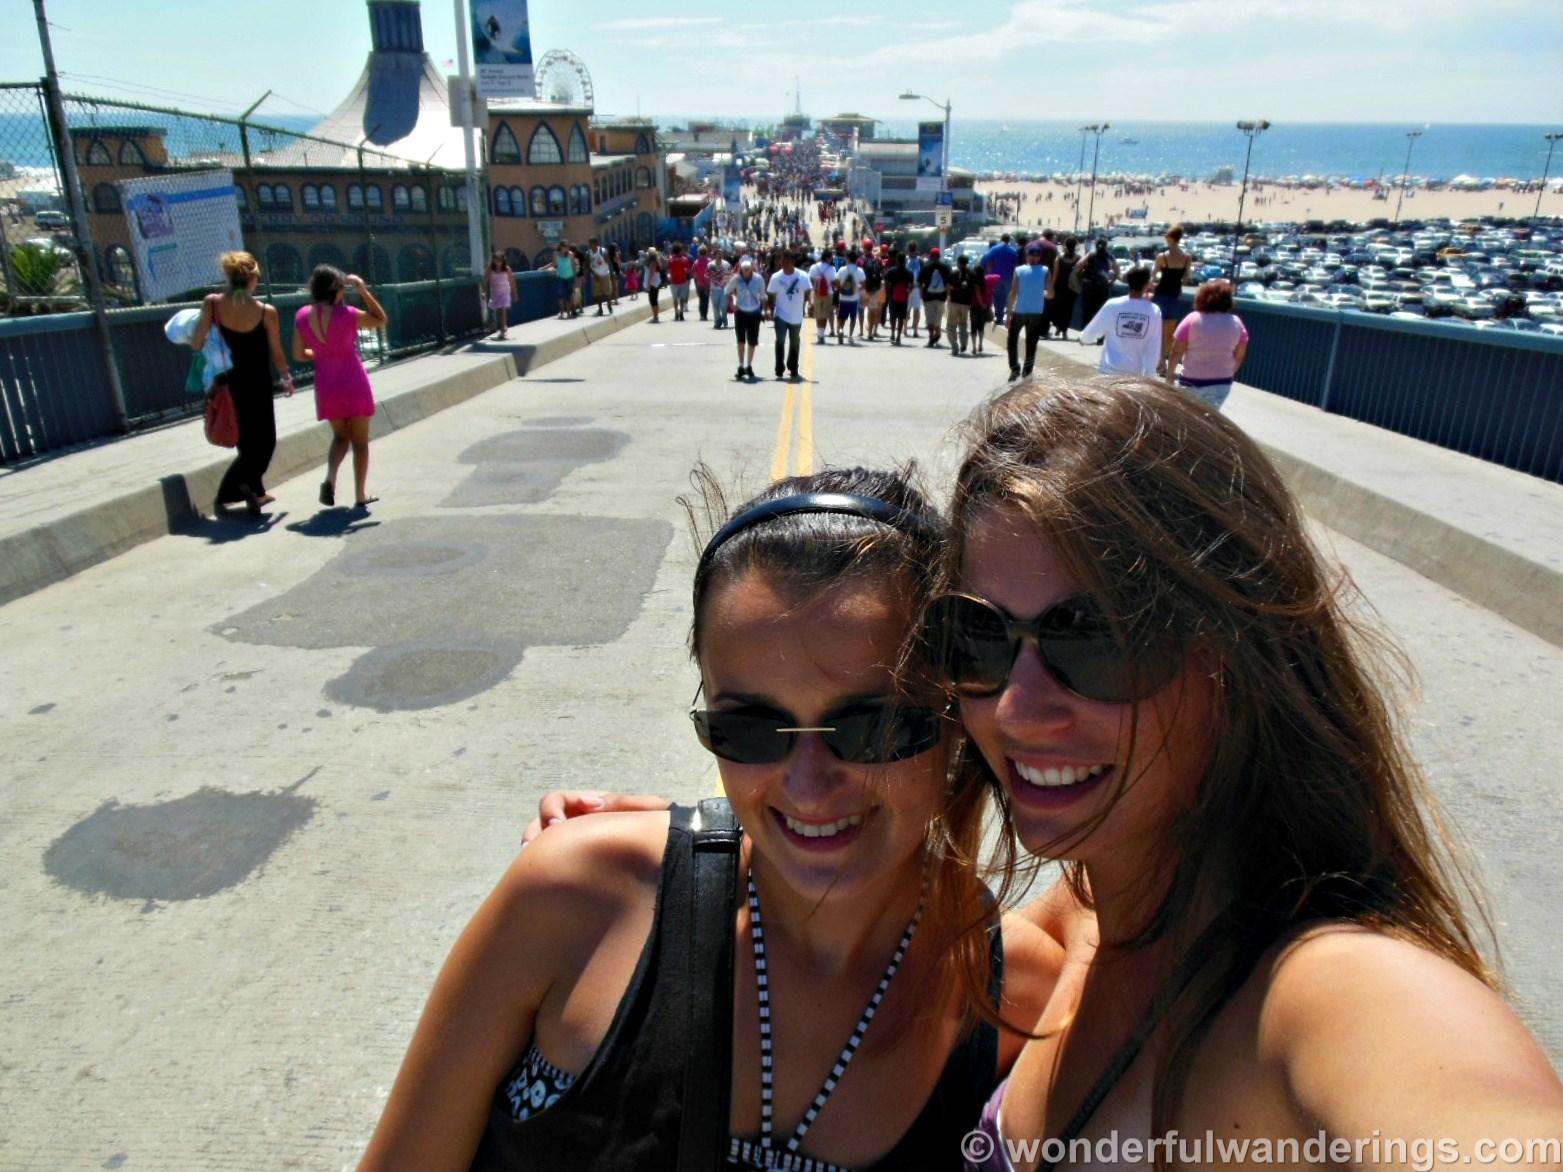 Sofie from Wonderful Wanderings. Santa Monica Pier, California.